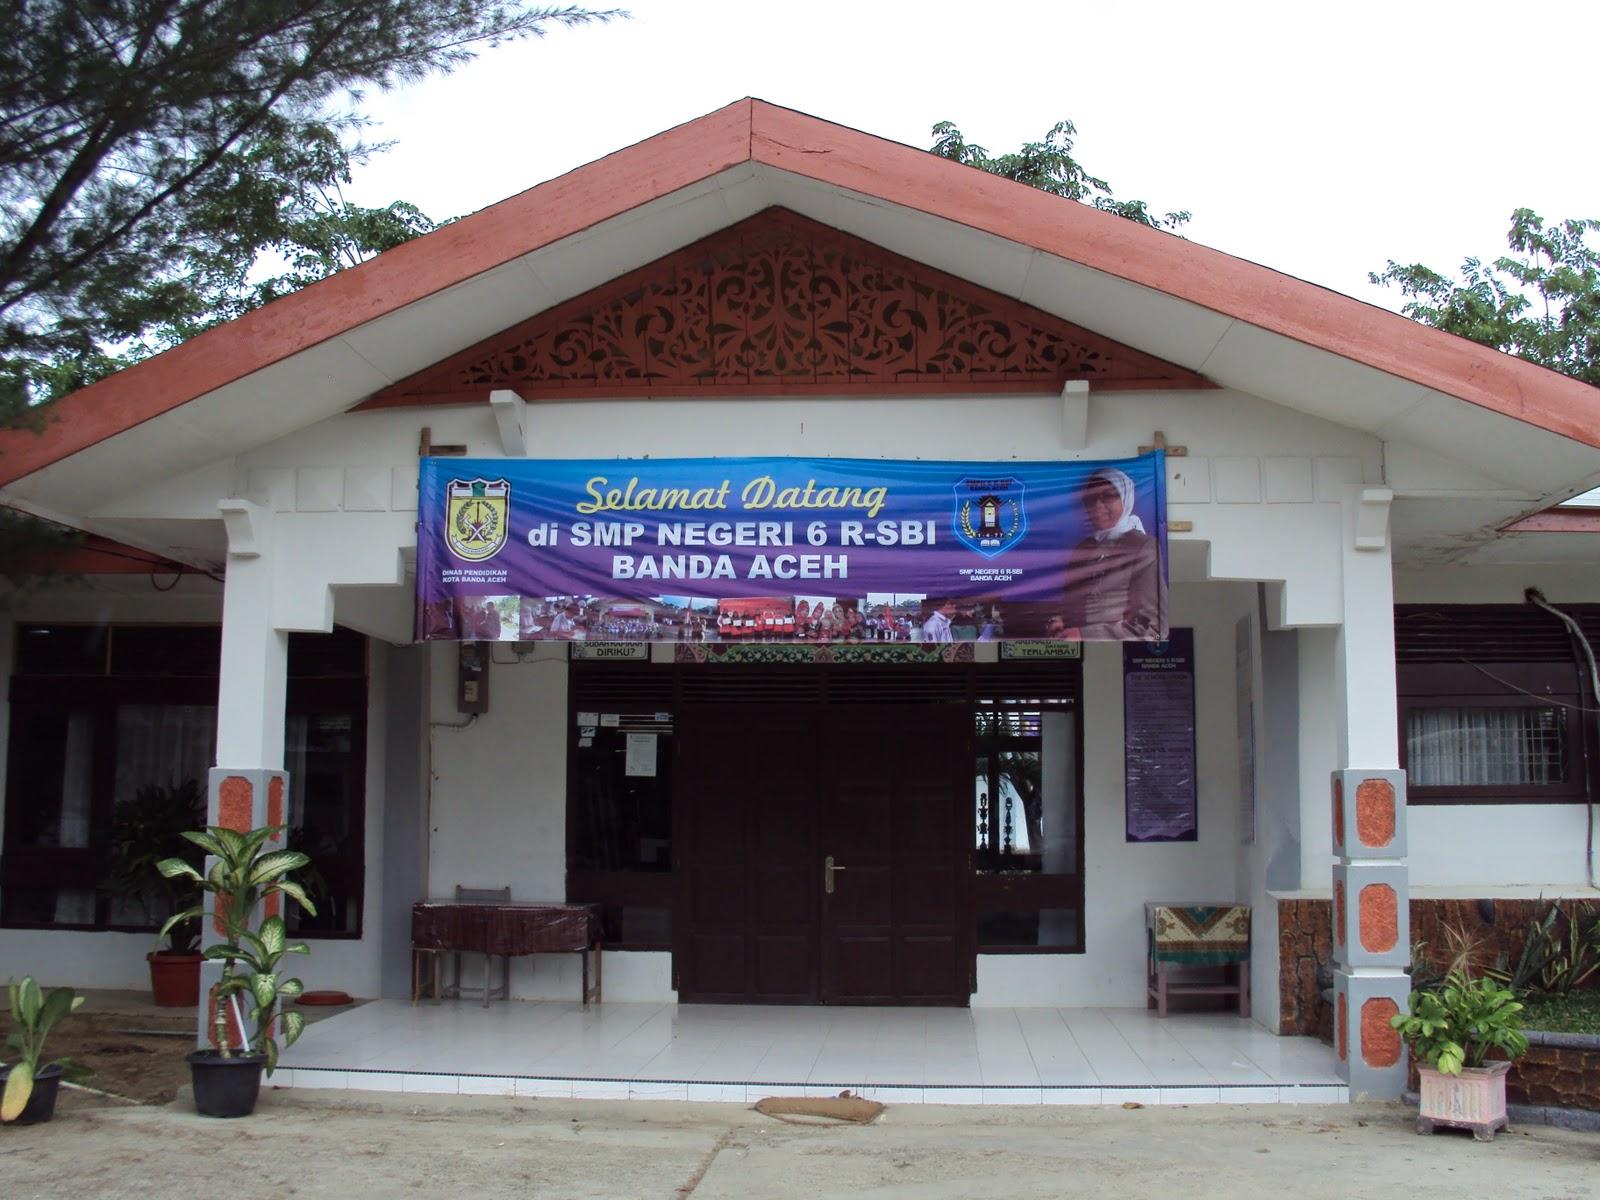 Smpn 6 Rsbi Banda Aceh